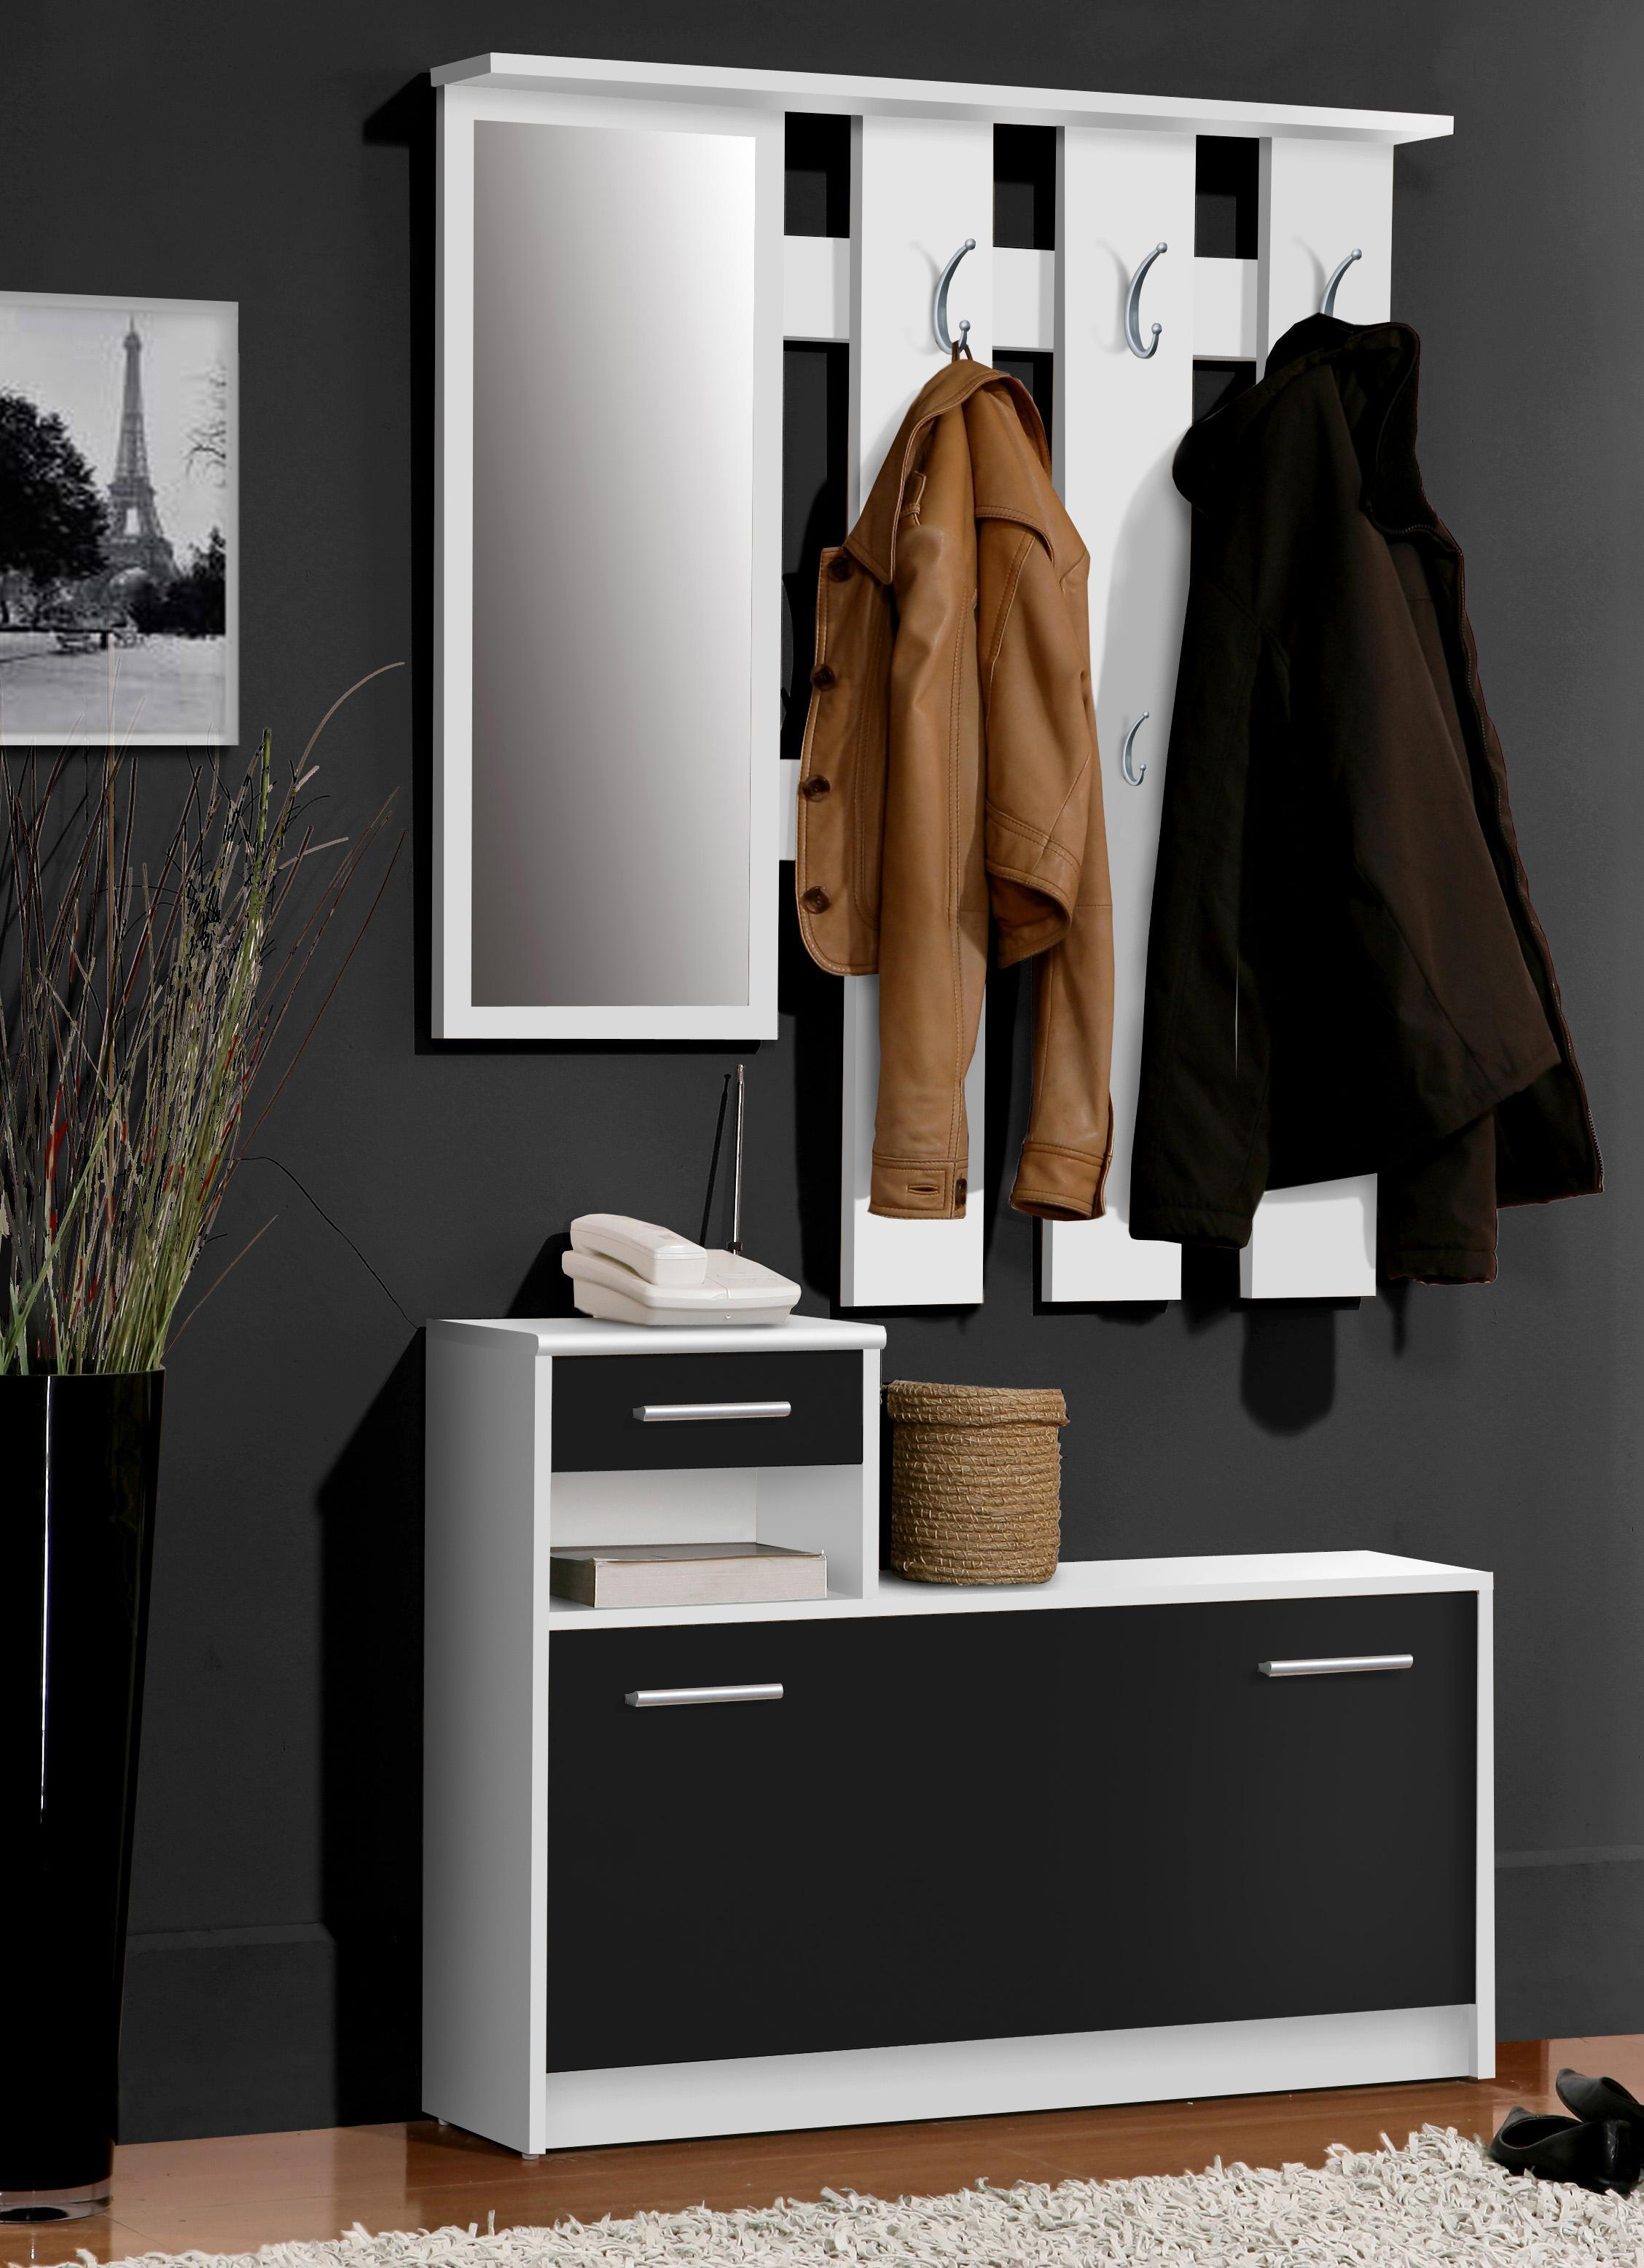 Newface foxi garderobe holz sandeiche 97 5 x 25 x 180 for Garderobe 98 cm